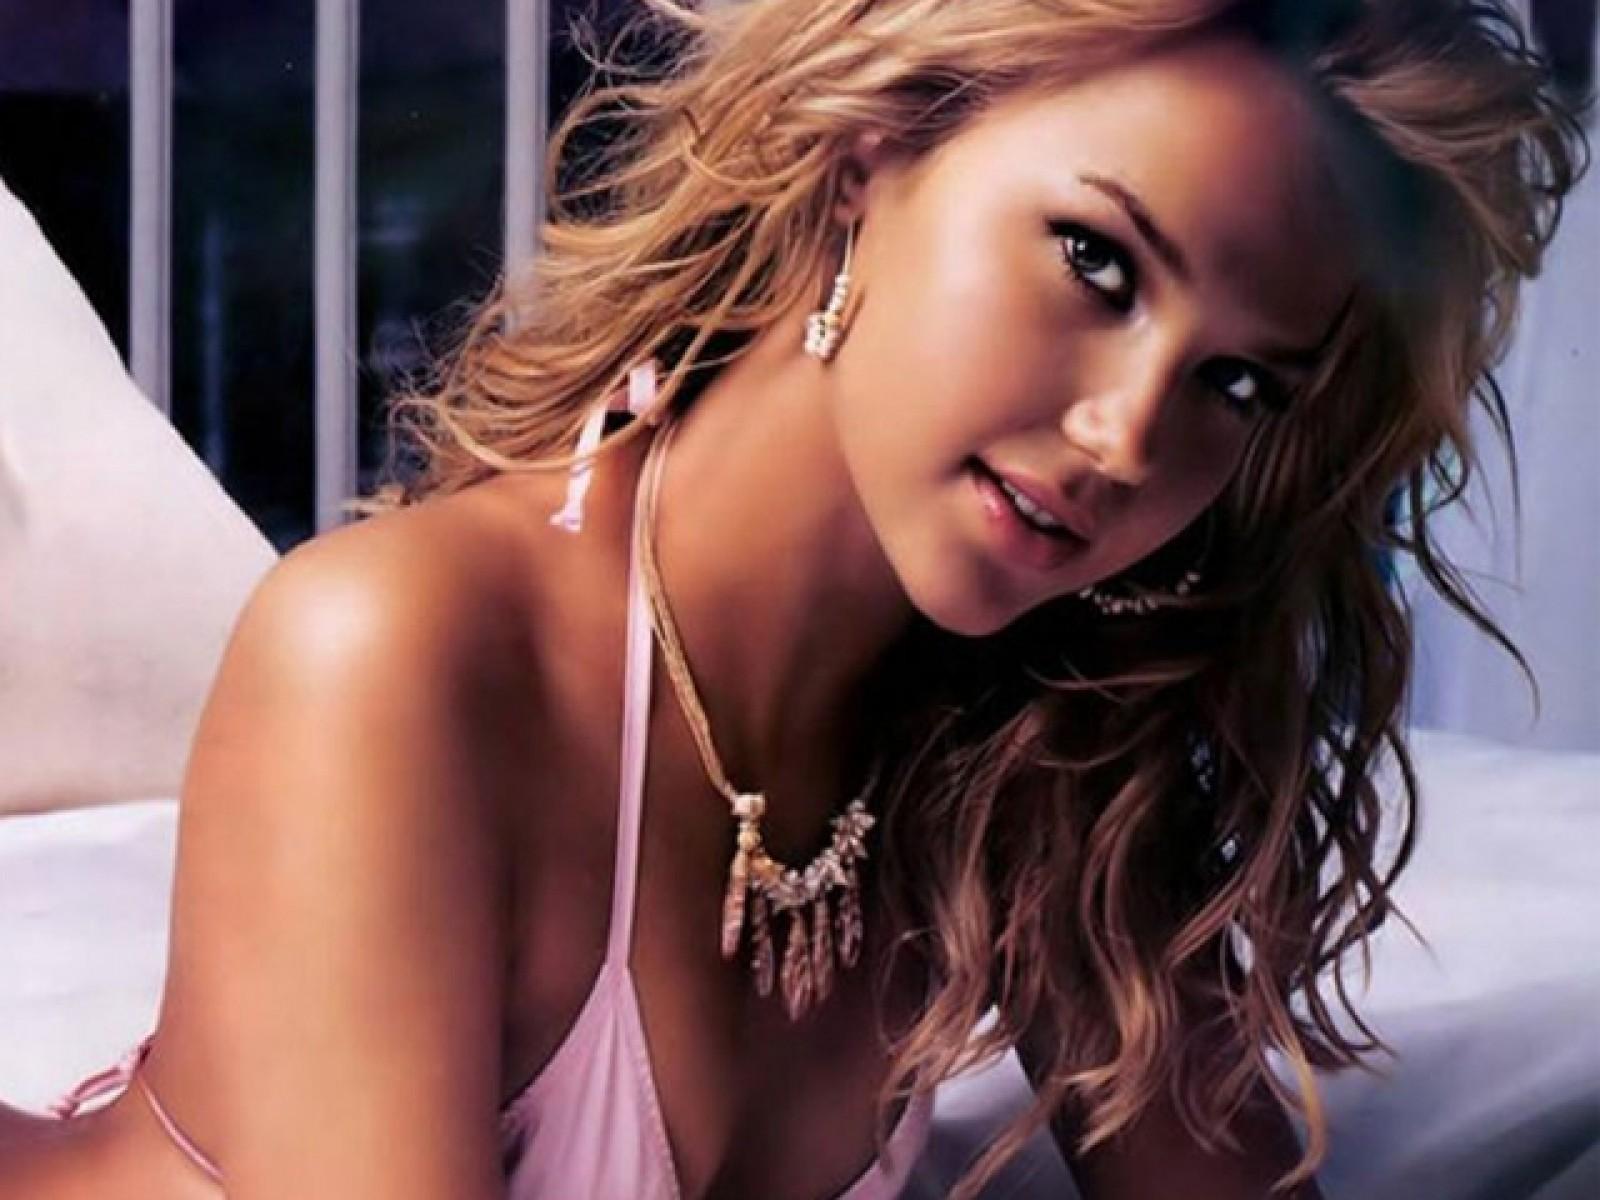 Beyonce britney spears jennifer lopez amp nicole scherzinger - 2 part 7